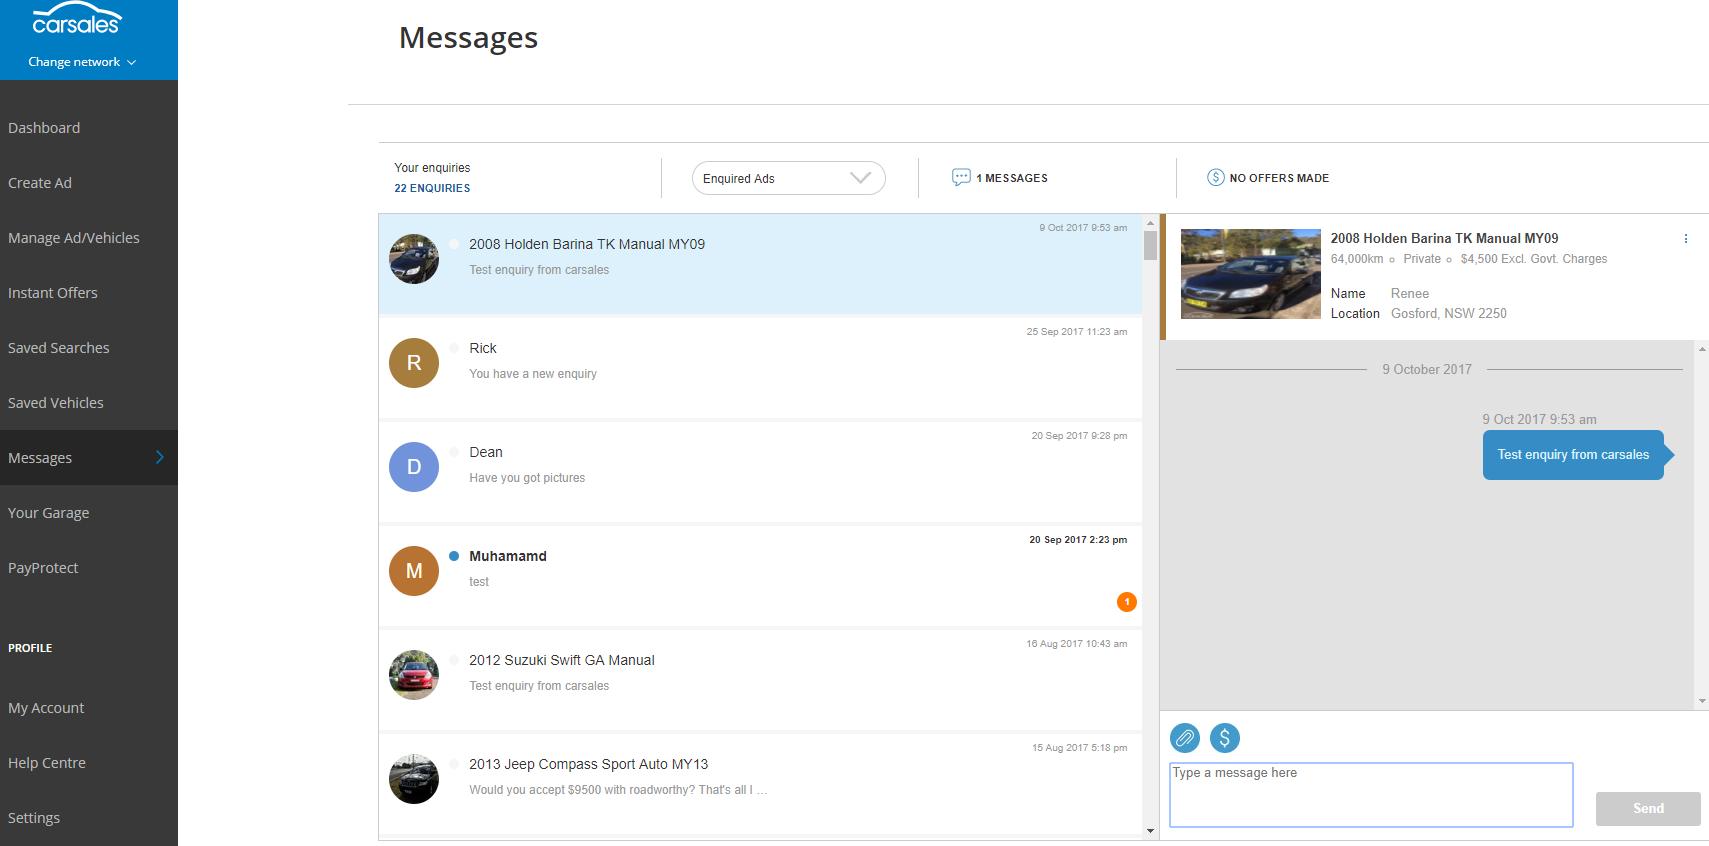 How Do I View Or Reply To Messages Carsales Com Au Help Center